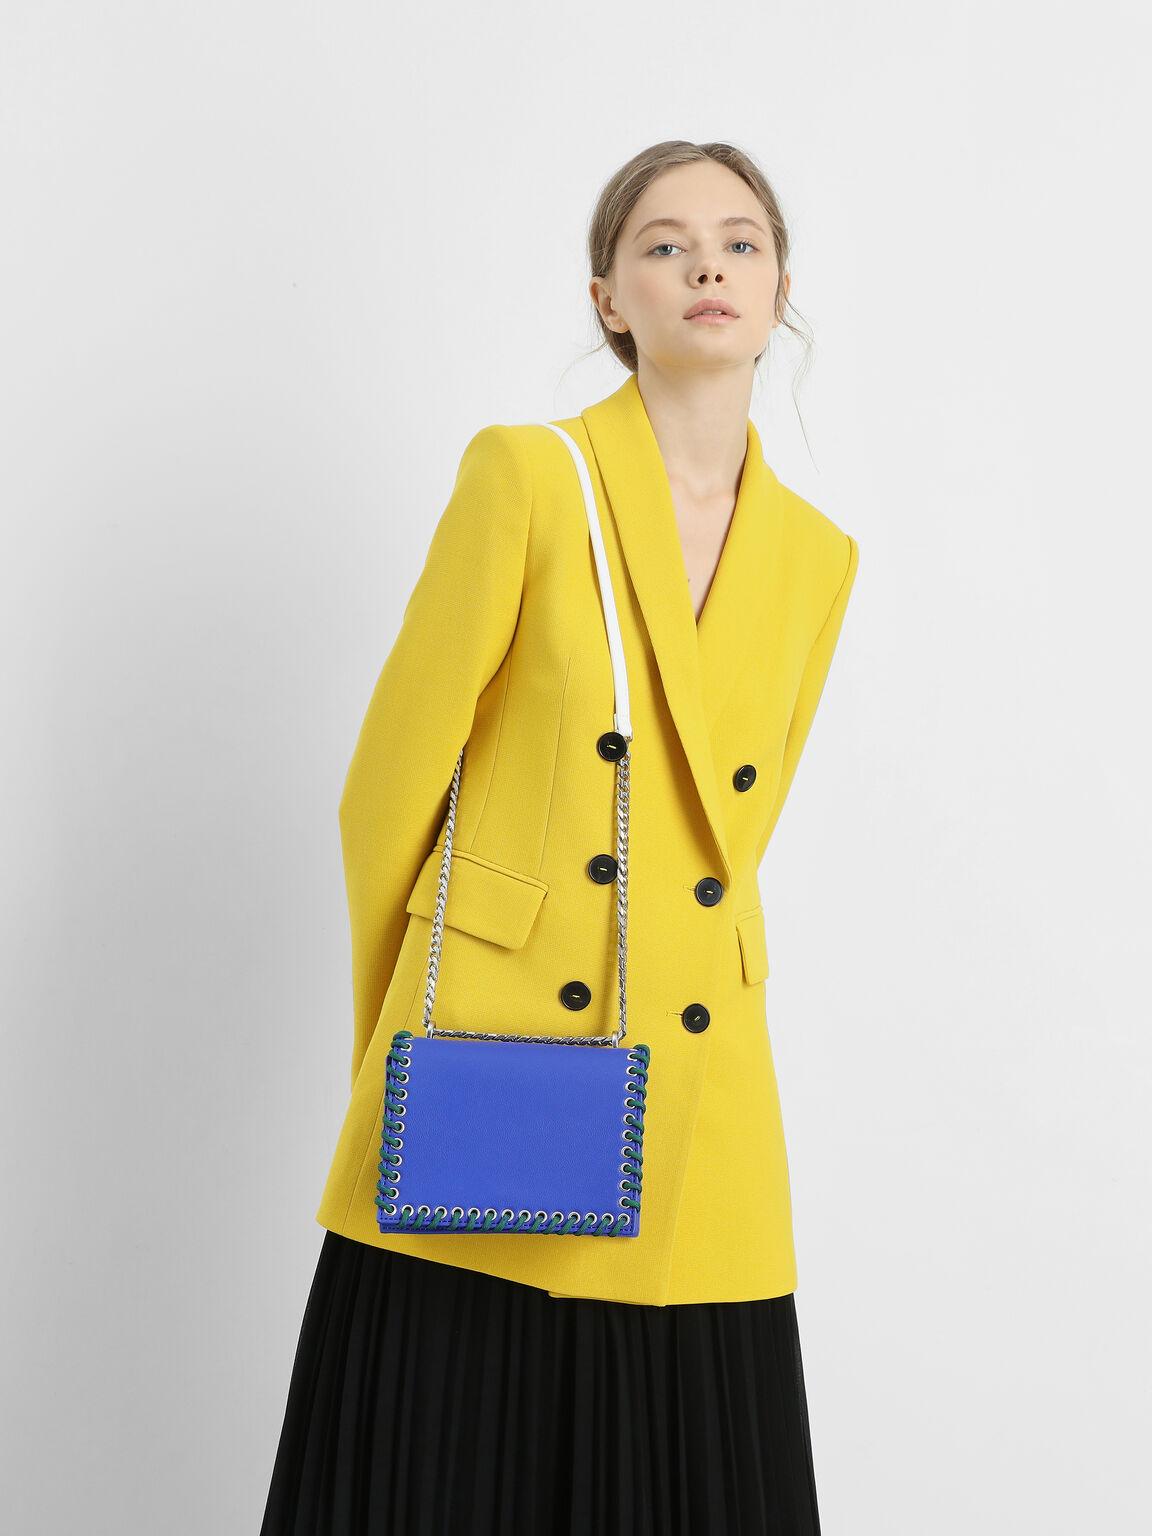 Grommet Accented Crossbody Bag, Blue, hi-res